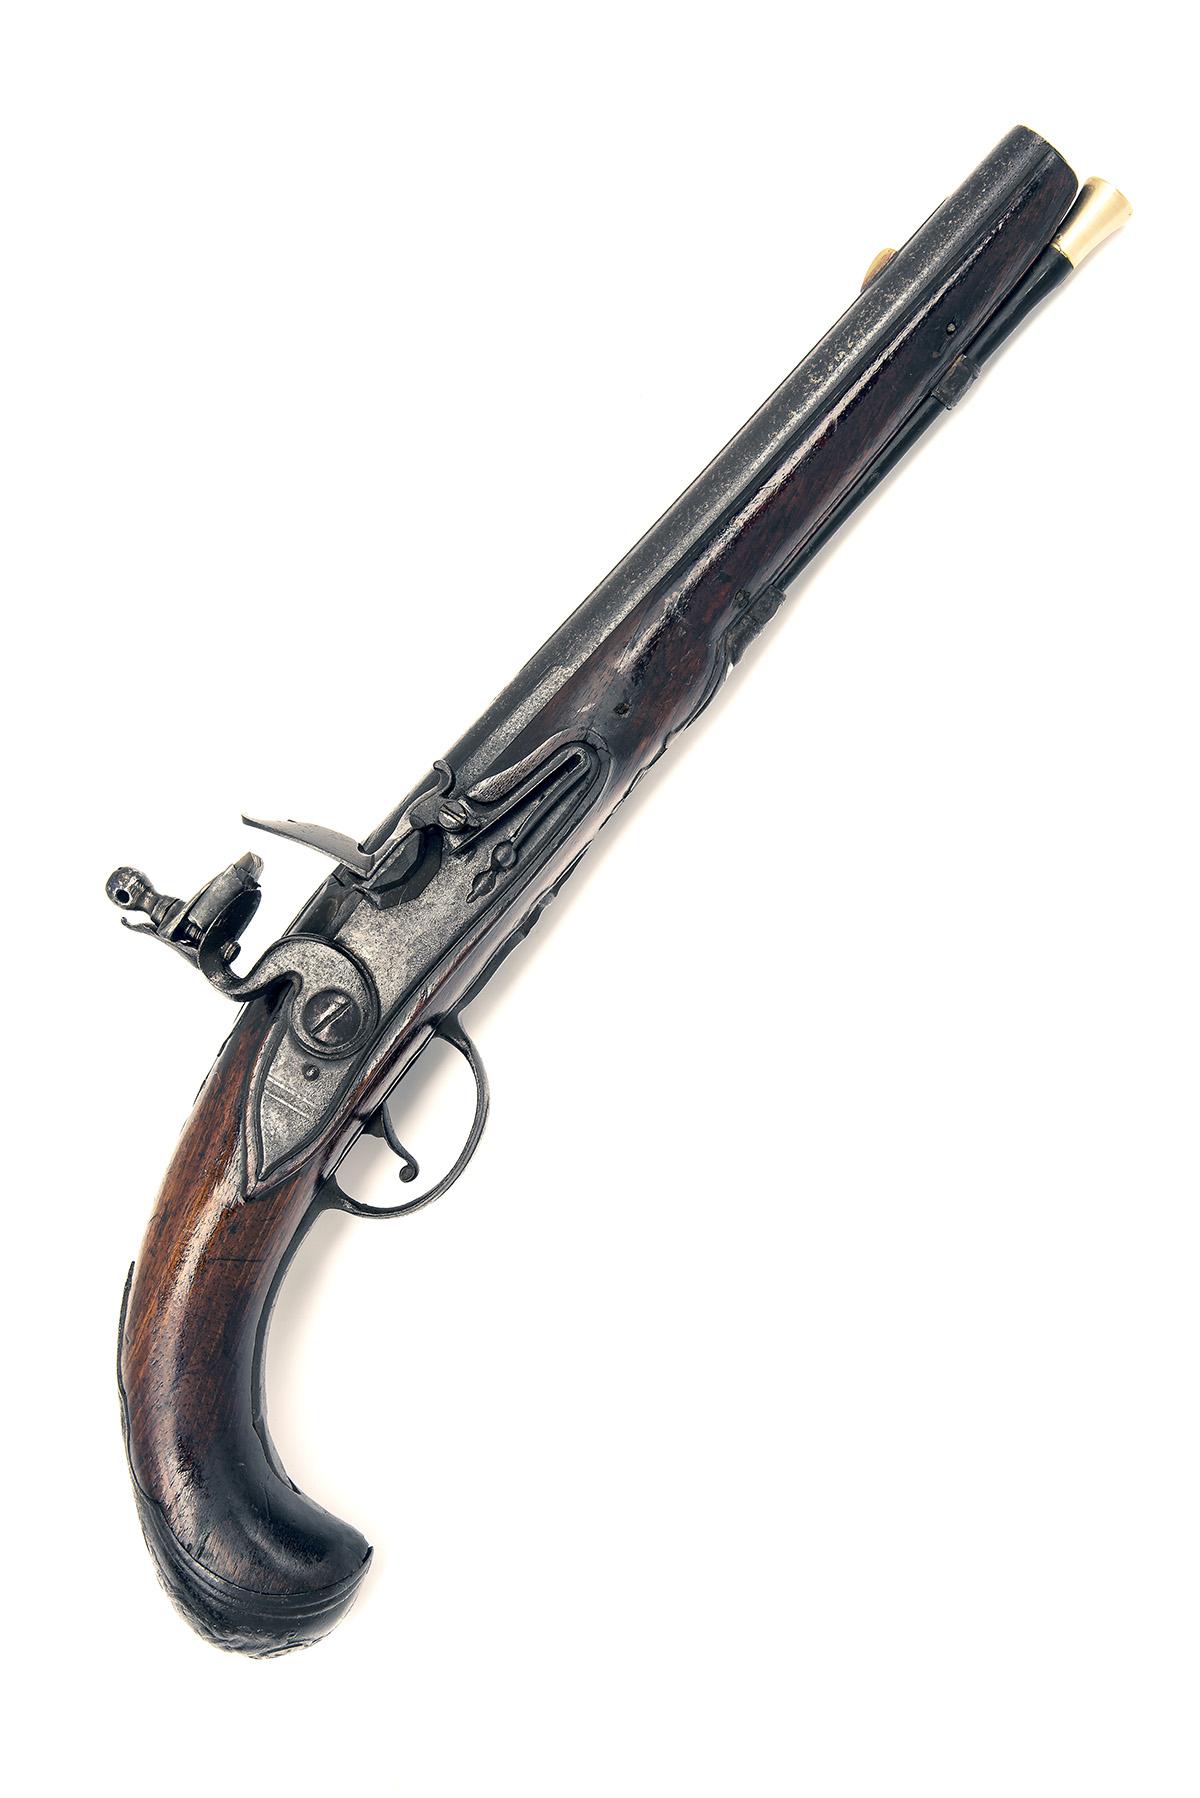 A 22-BORE FLINTLOCK HORSE-PISTOL, UNSIGNED, no visible serial number, German or Bohemian circa 1775,